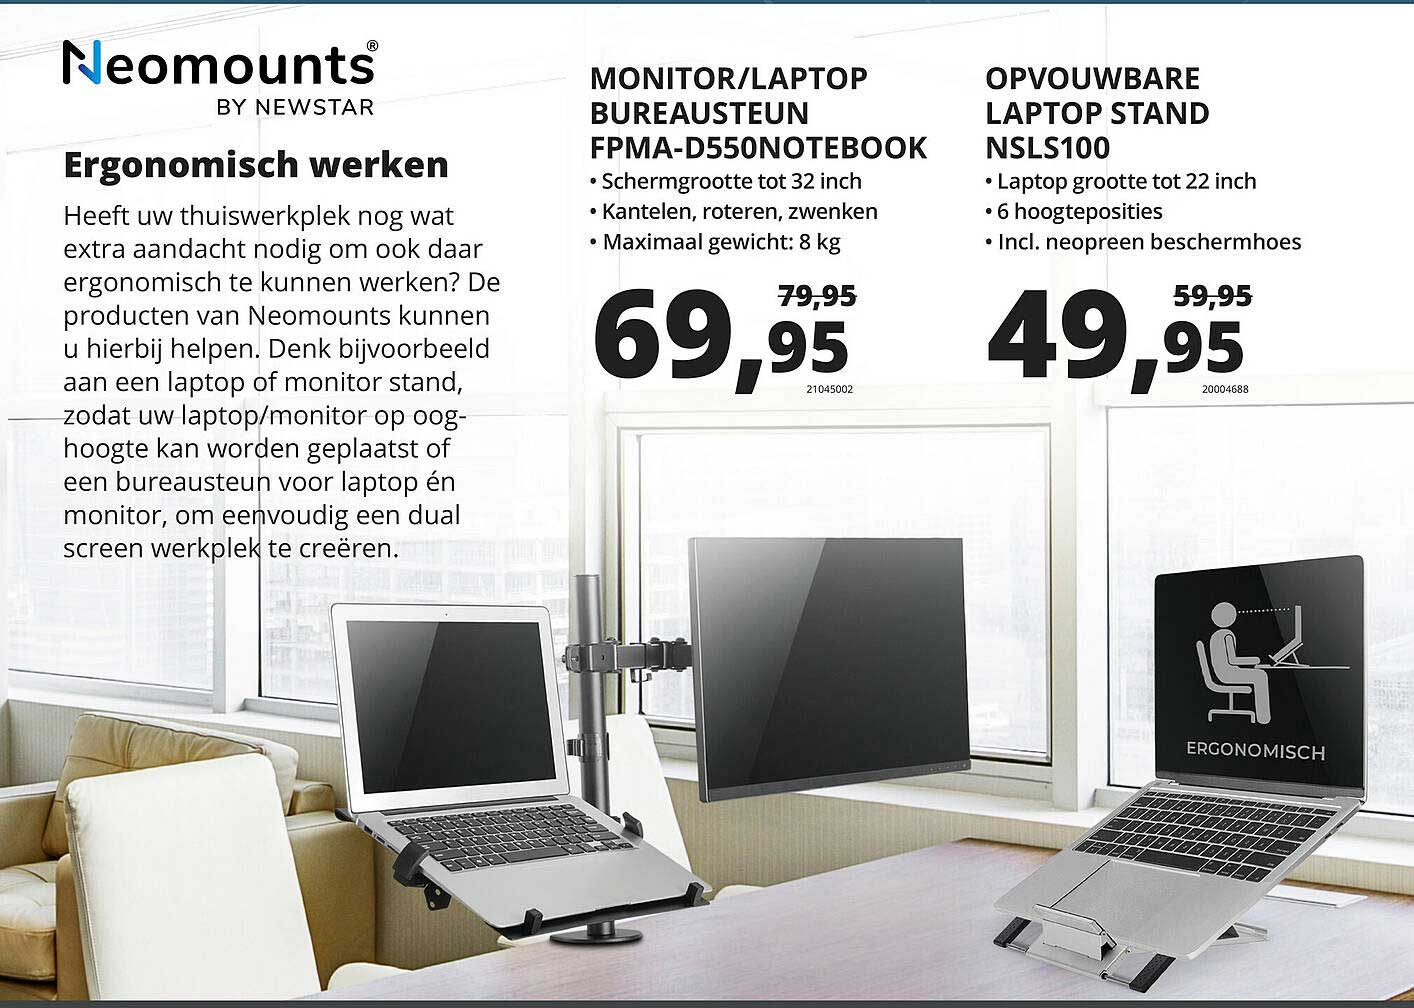 Paradigit Neomounts By Newstar Monitor-Laptop Bureausteun FPMA-D550Notebook Of Opvouwbare Laptop Stand NSLS100